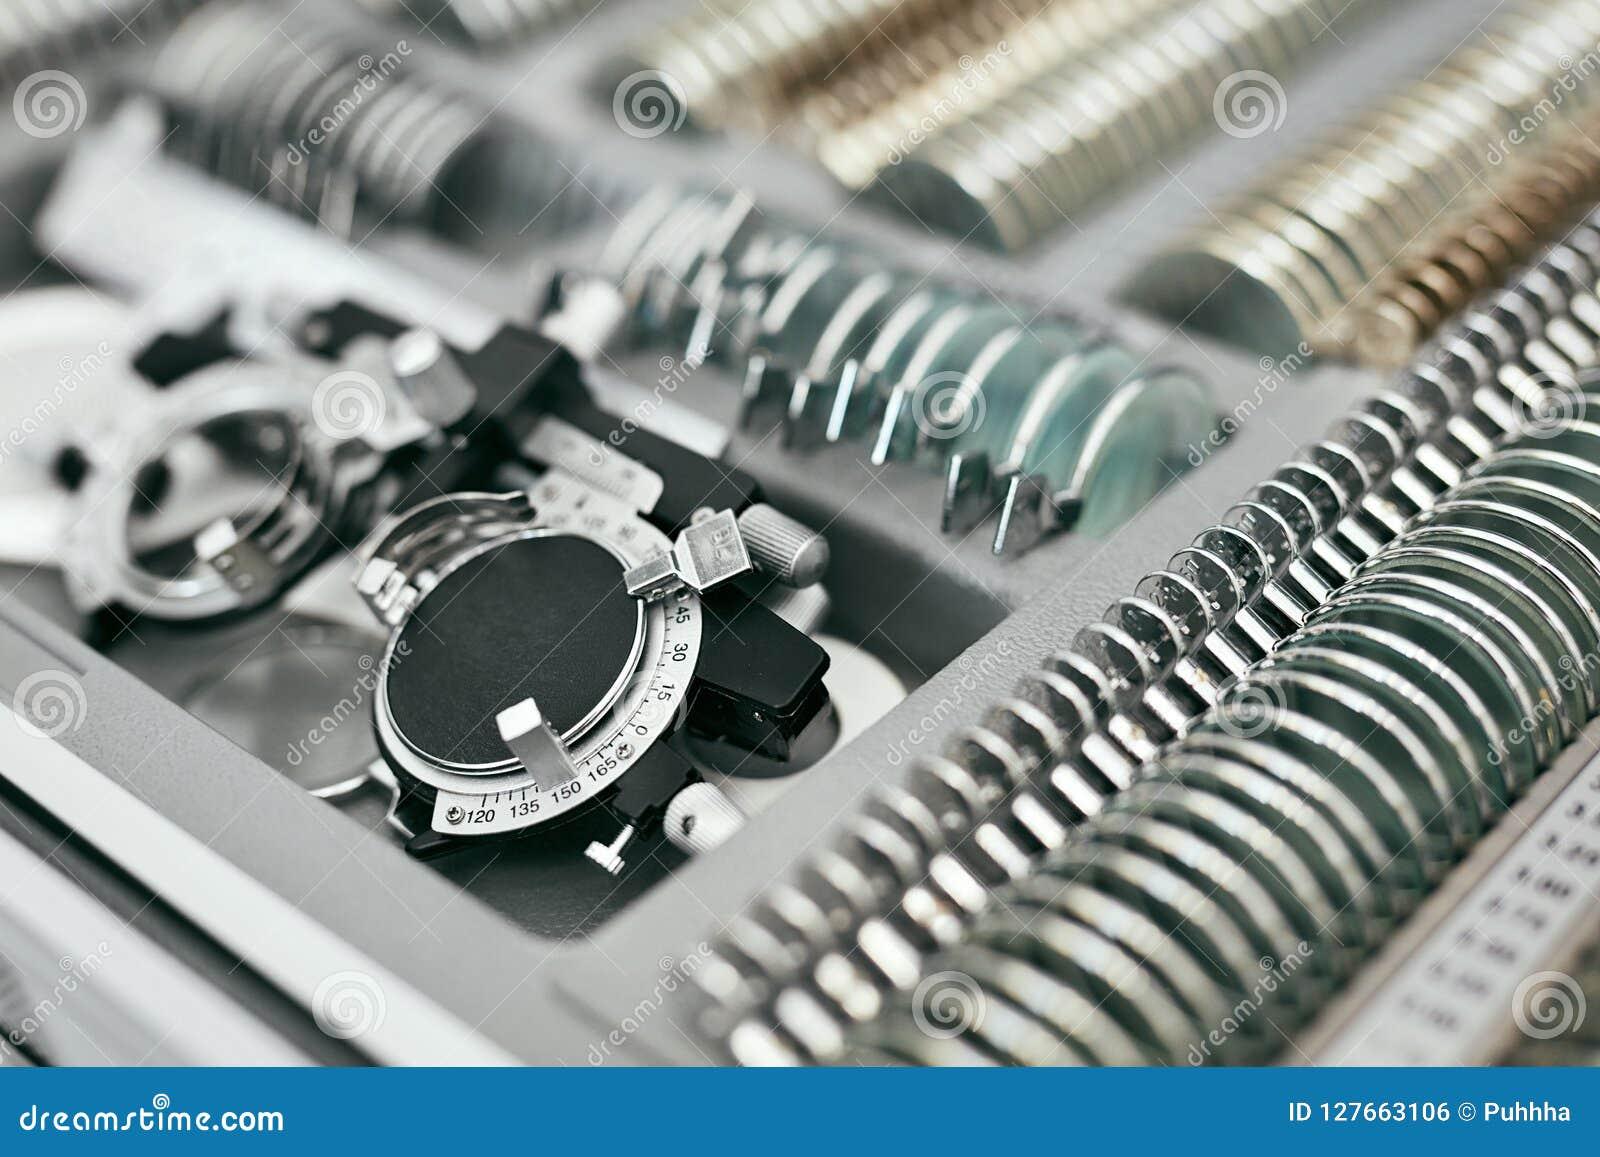 Ophthalmology Medical Equipment, Tools For Eyesight Exam Closeup